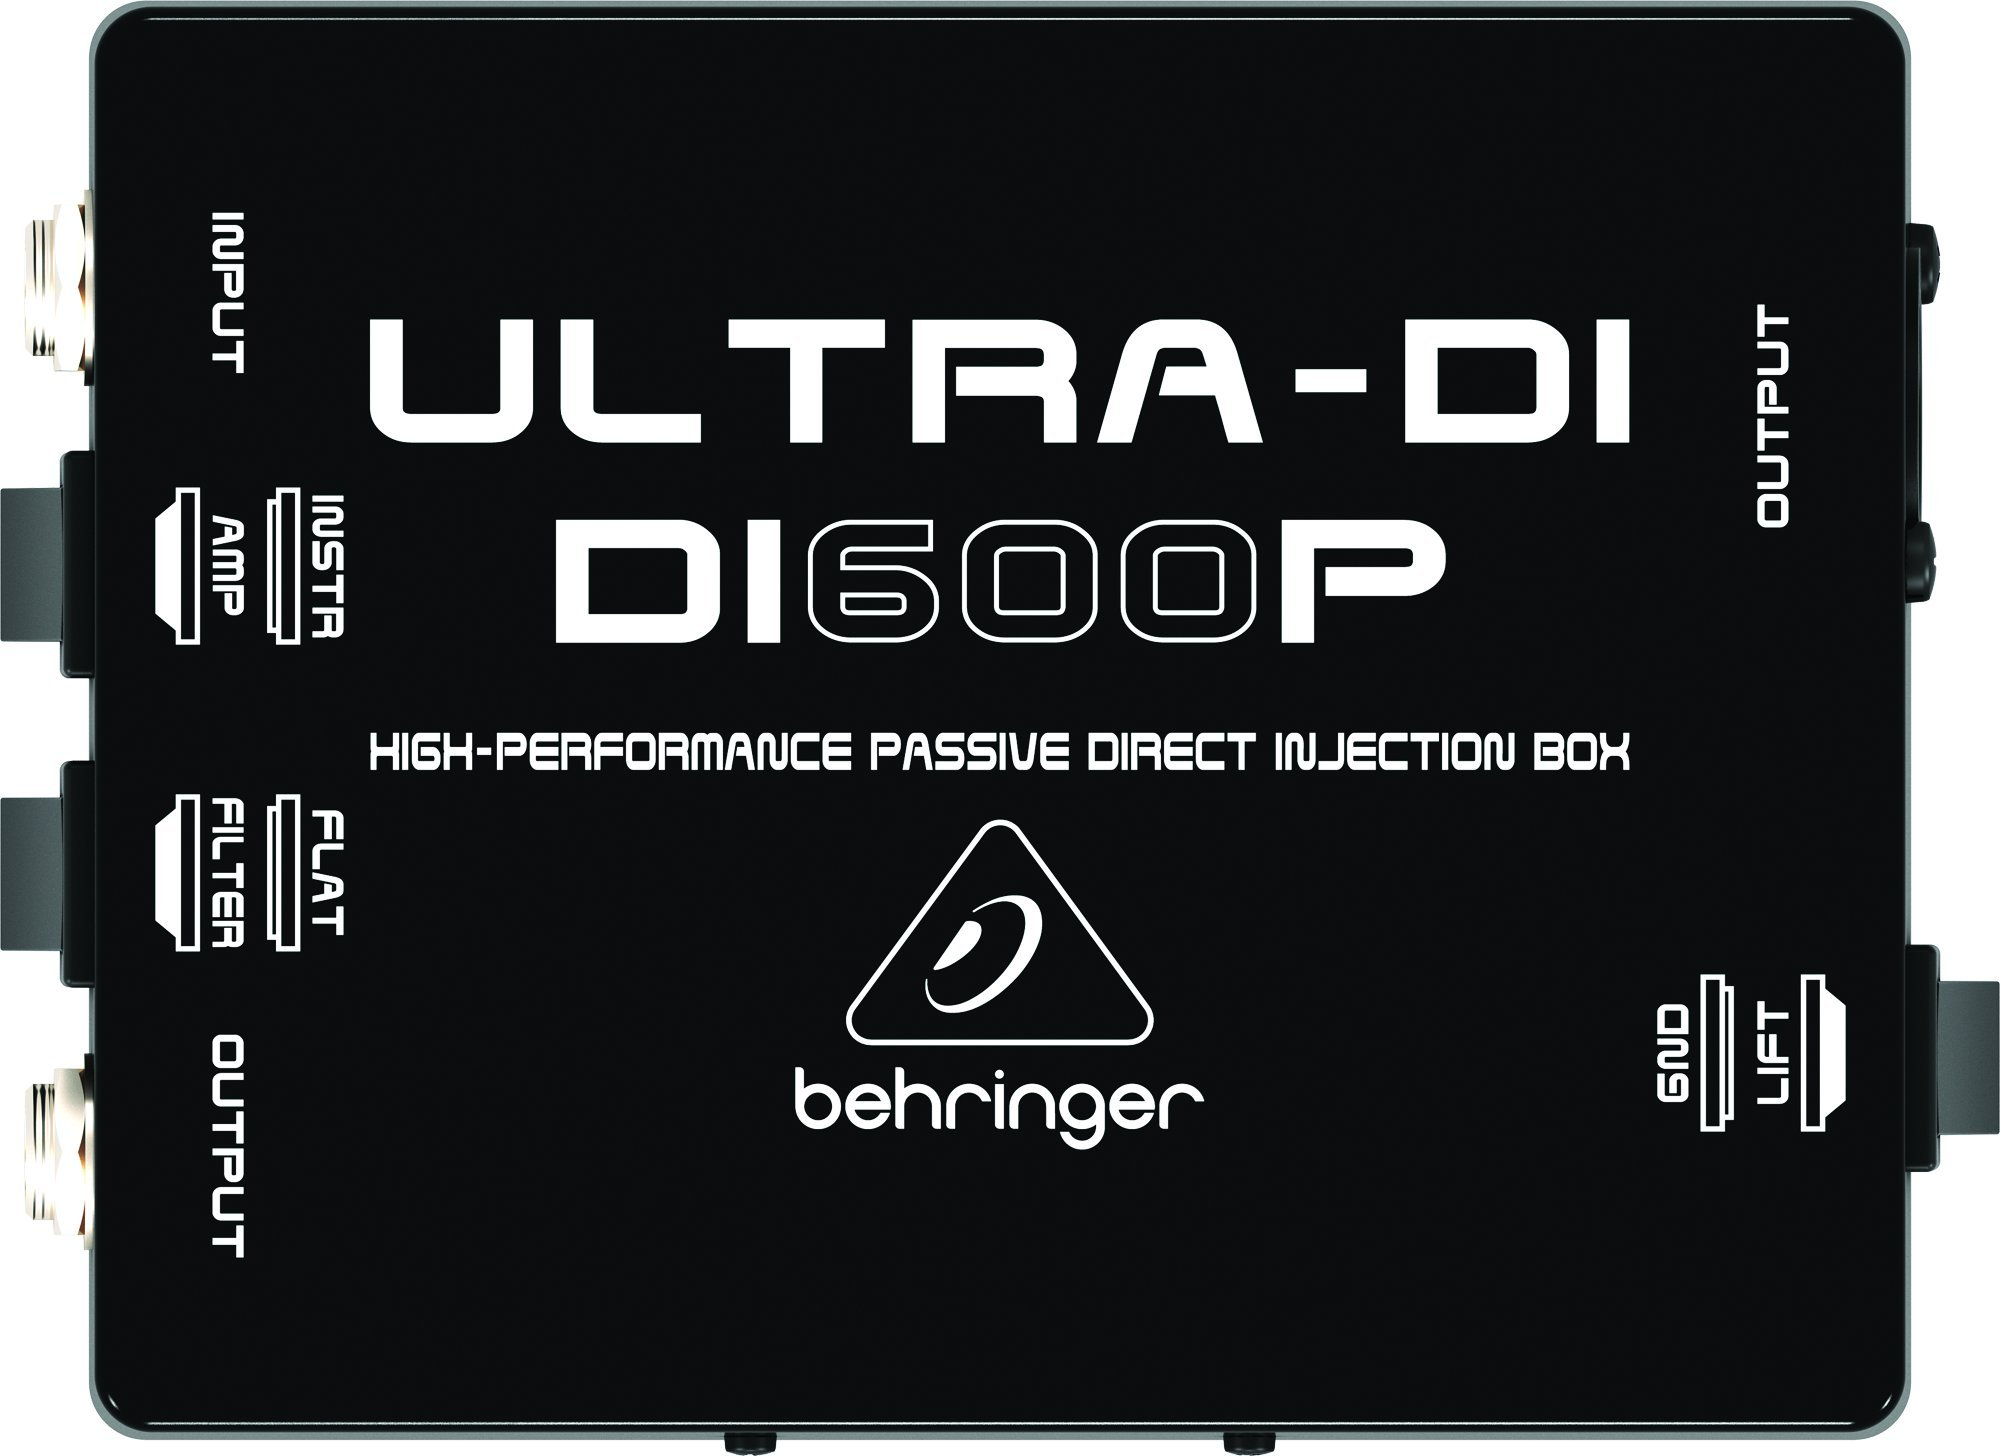 BEHRINGER ULTRA-DI DI600P by Behringer